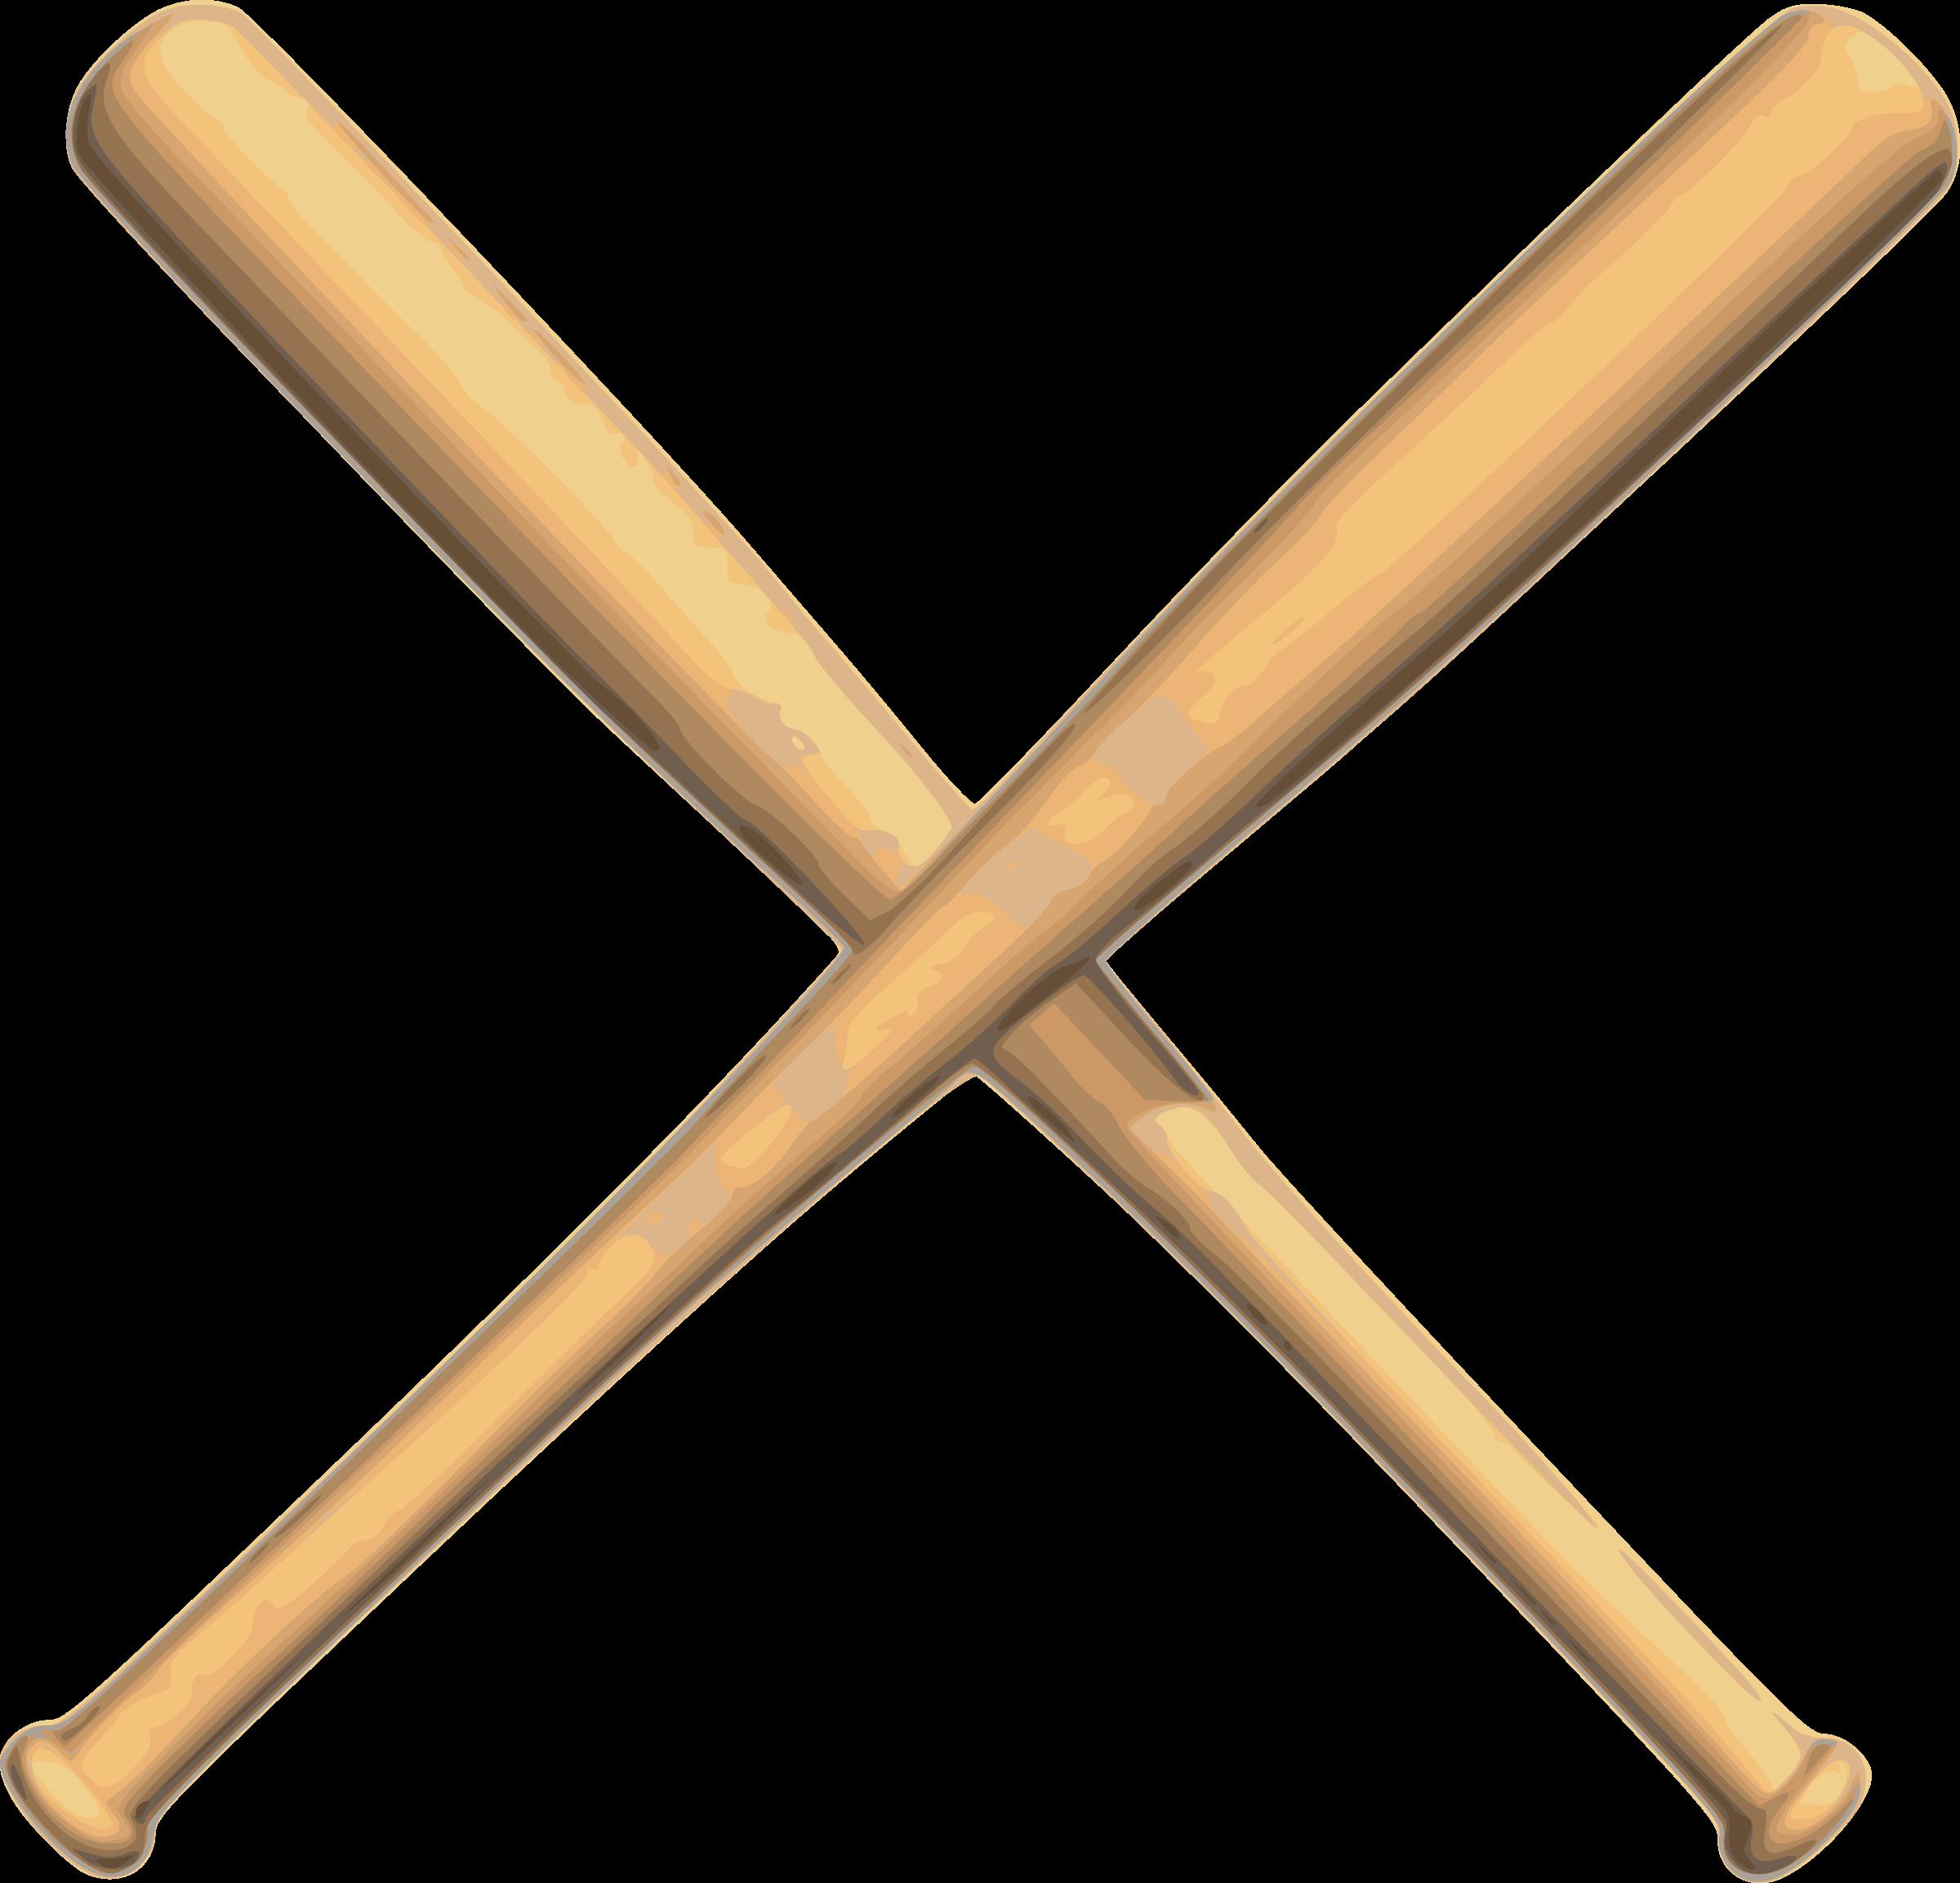 Baseball bat baseball crossed bats clipart.